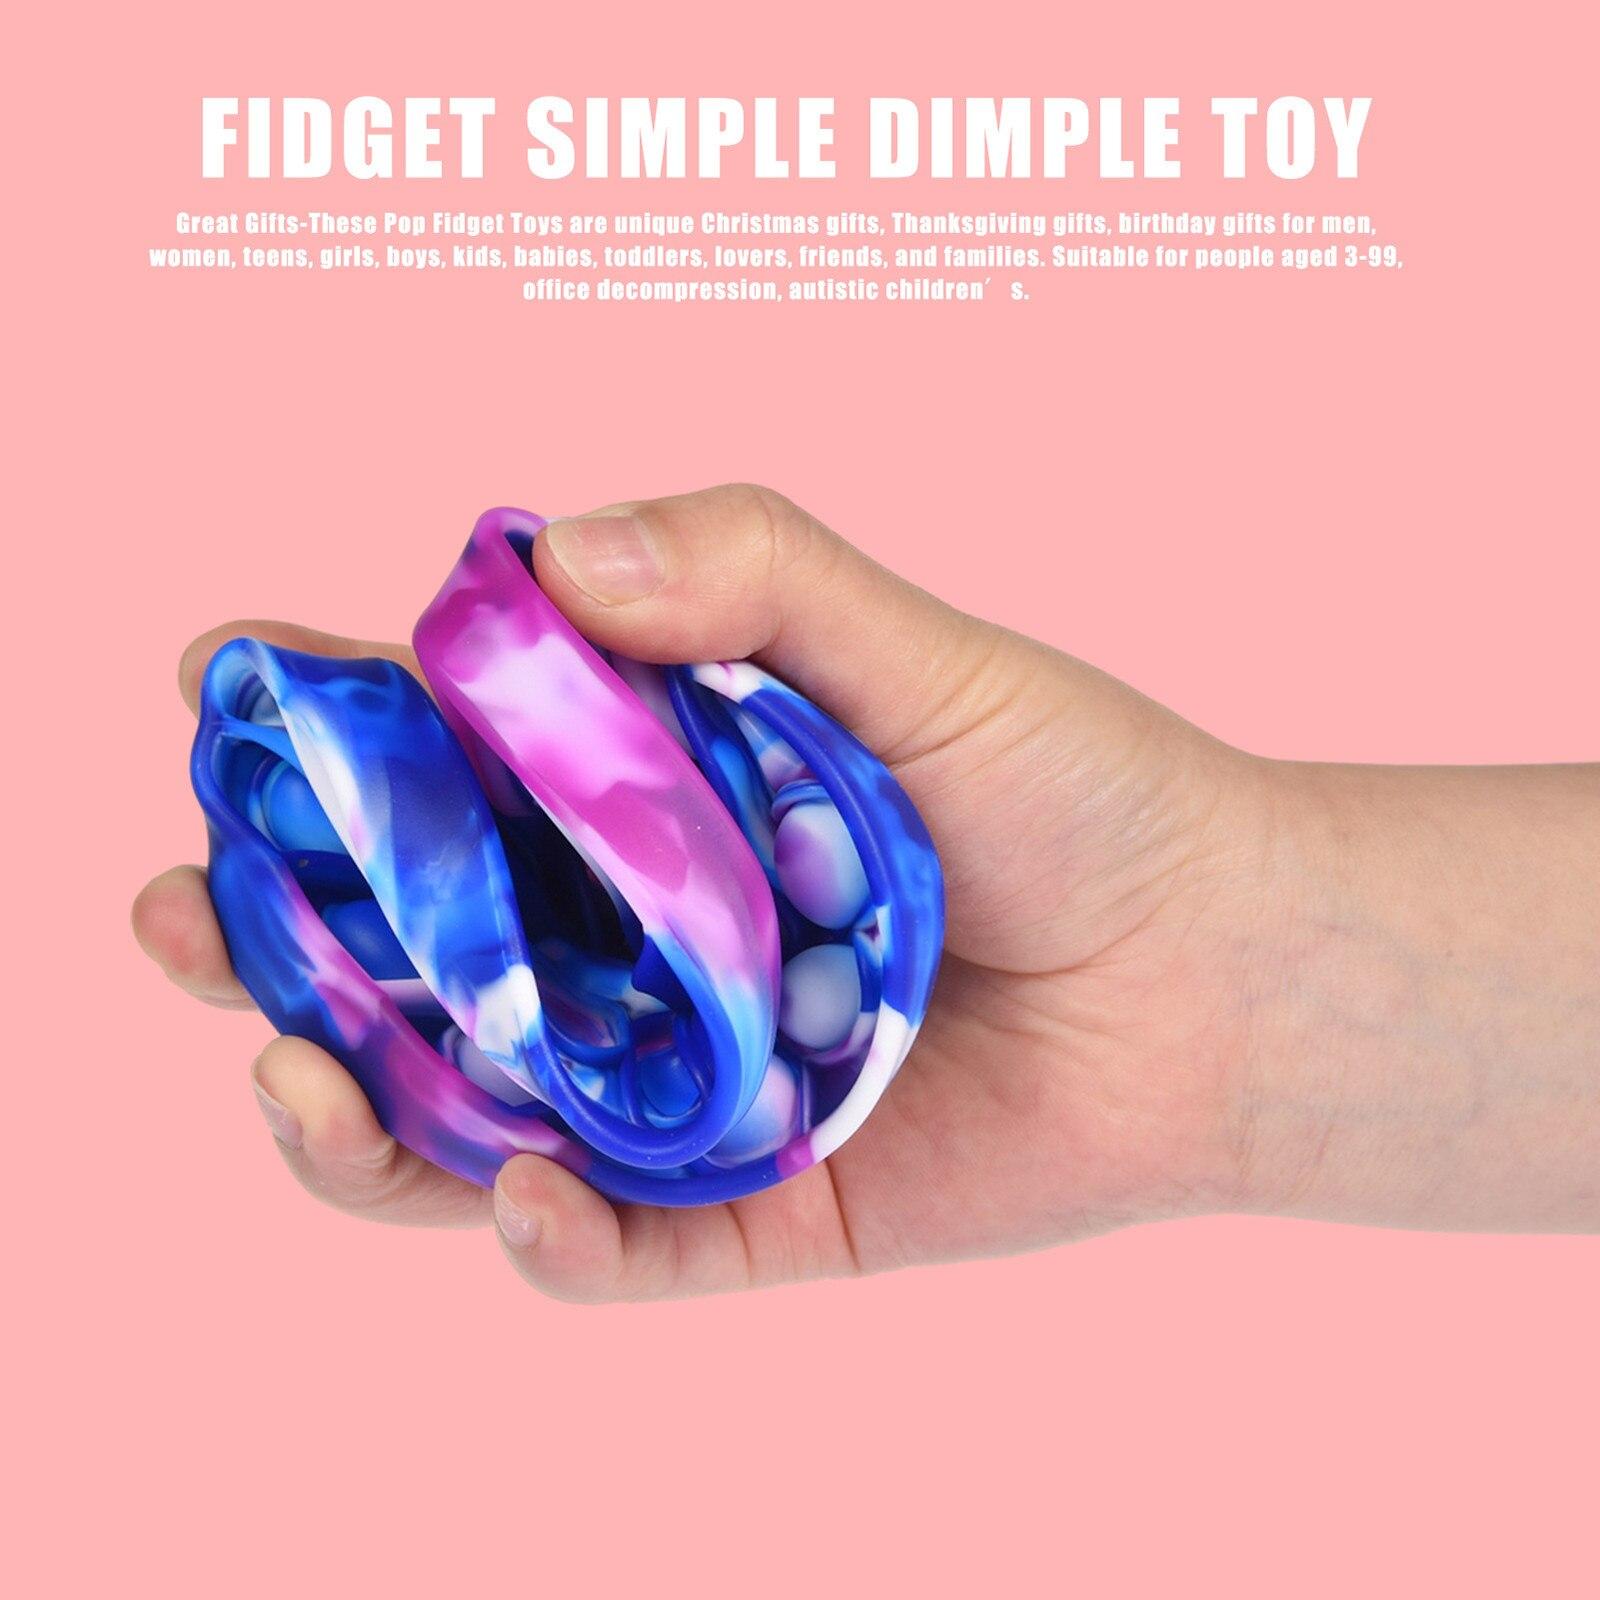 Bubble-Fidget-Toys Strings Anti-Stress-Set Relief Figet Sensory Push-Pop Adults Children img4